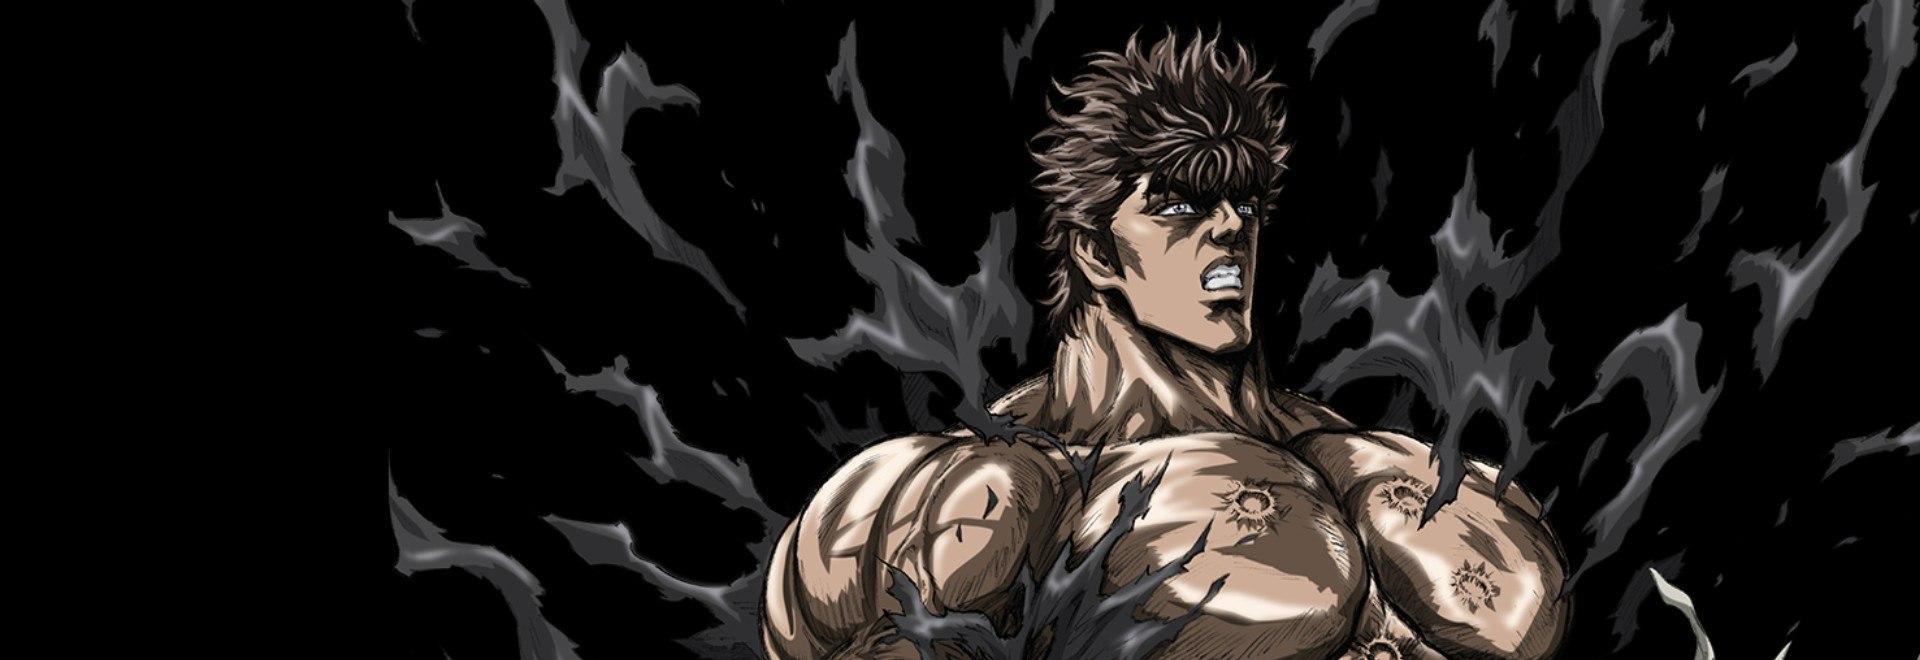 Ken il guerriero - La leggenda del vero salvatore